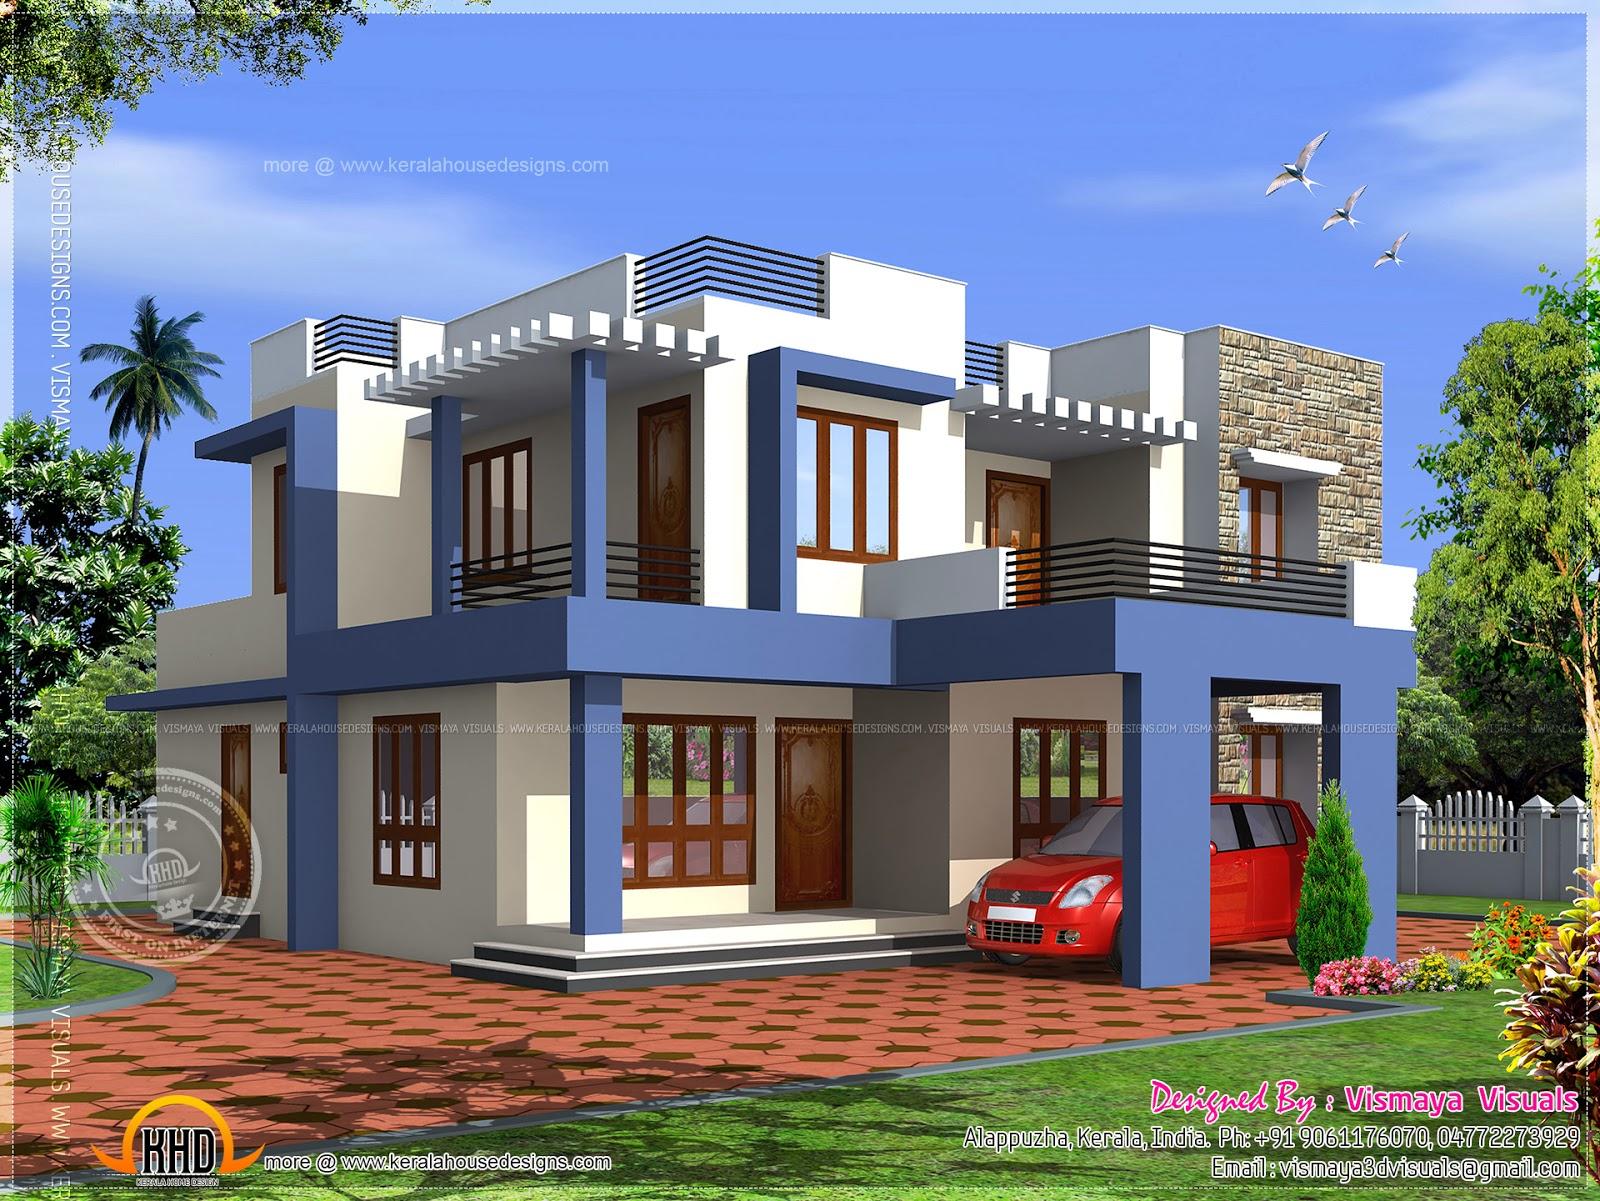 Box type 4 bedroom villa - Kerala home design and floor plans